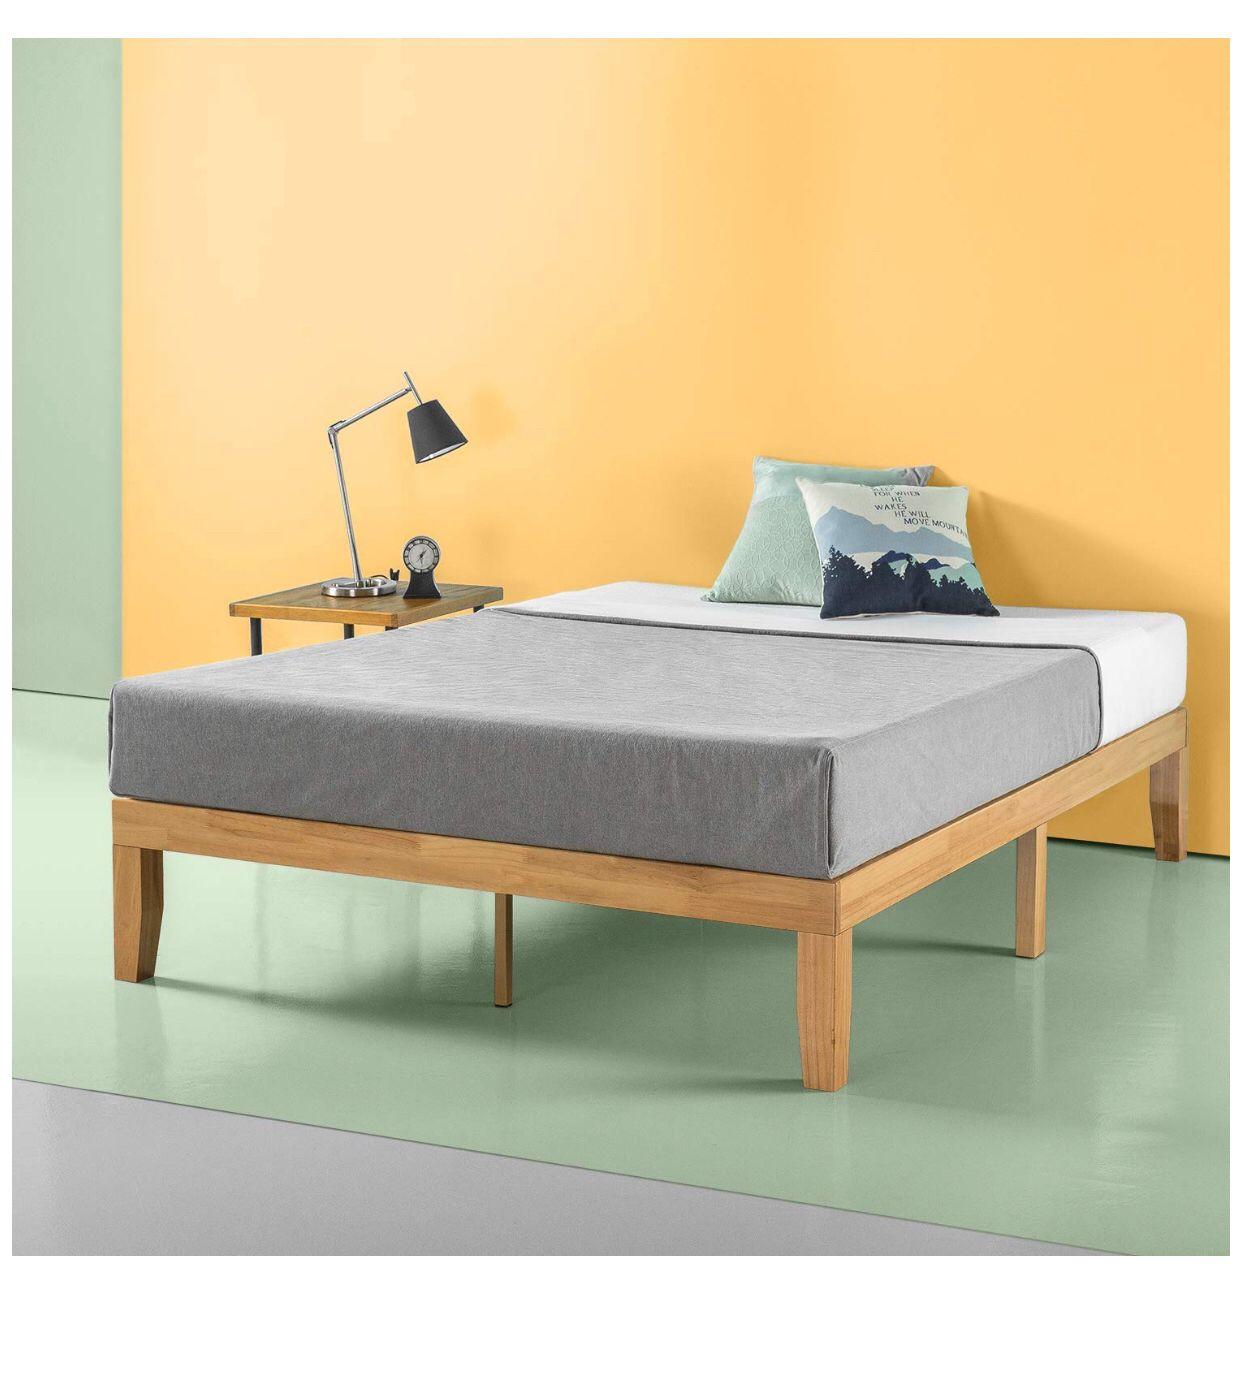 Ellerbe MidCentury Modern Platform Bed in 2020 Modern